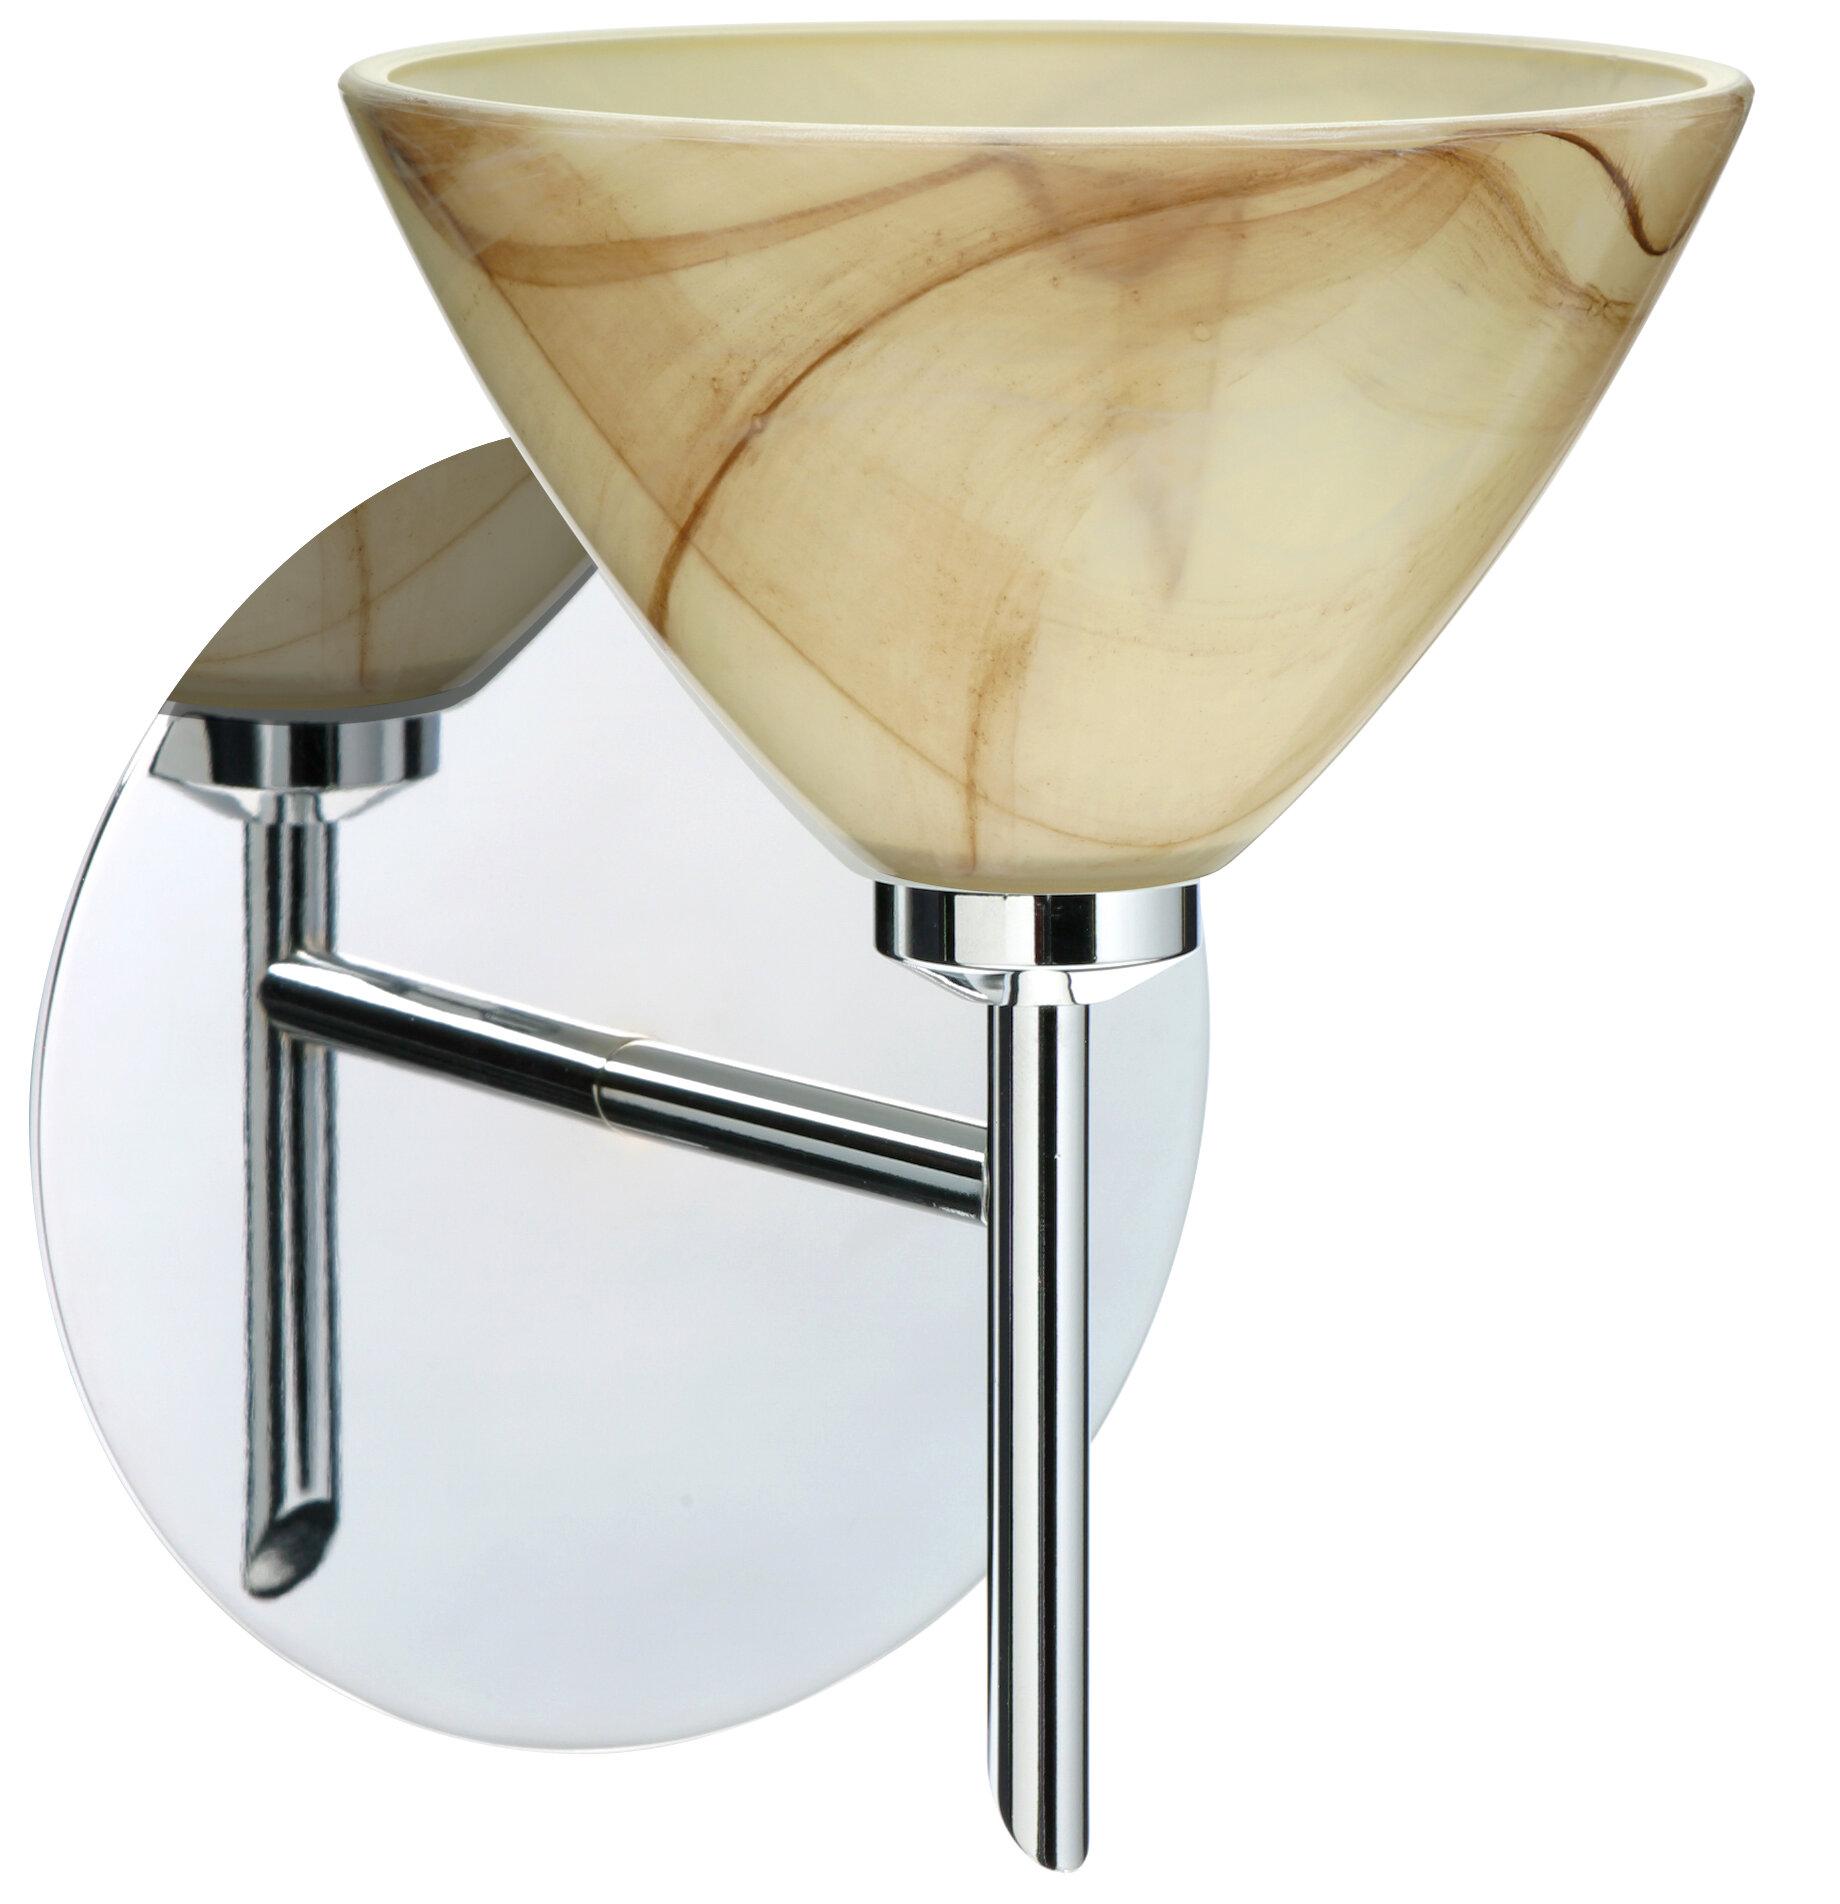 Ebern Designs Pownal 1 Light Armed Sconce